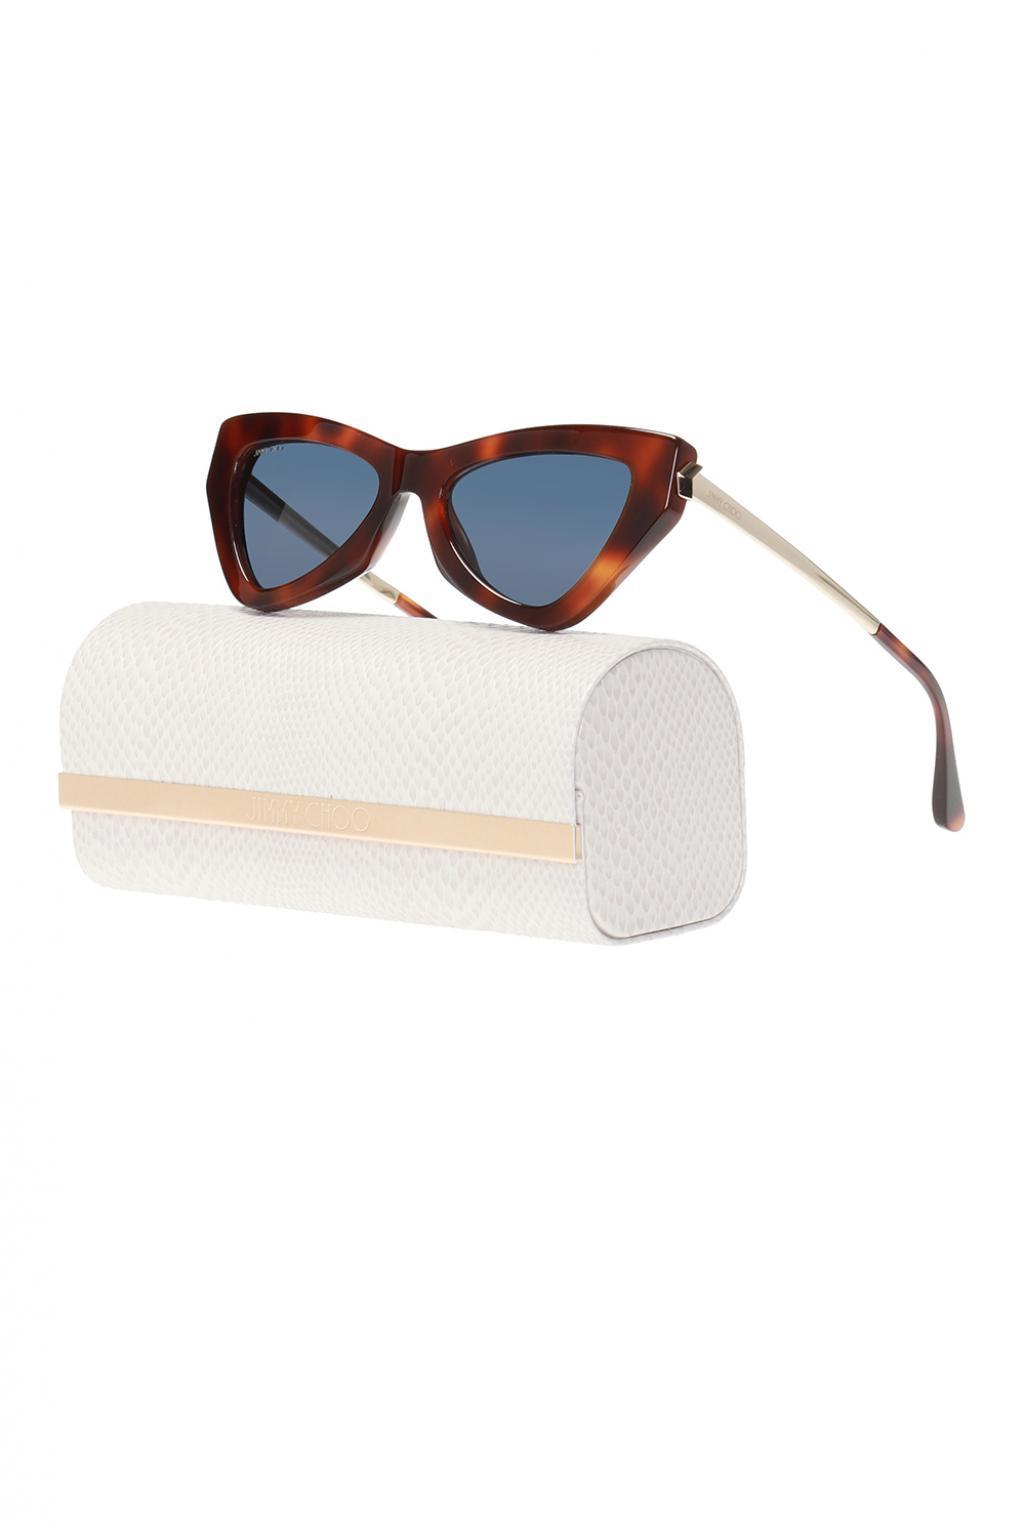 9fbac15fec70 Jimmy Choo - Brown  donna  Patterned Sunglasses - Lyst. View fullscreen